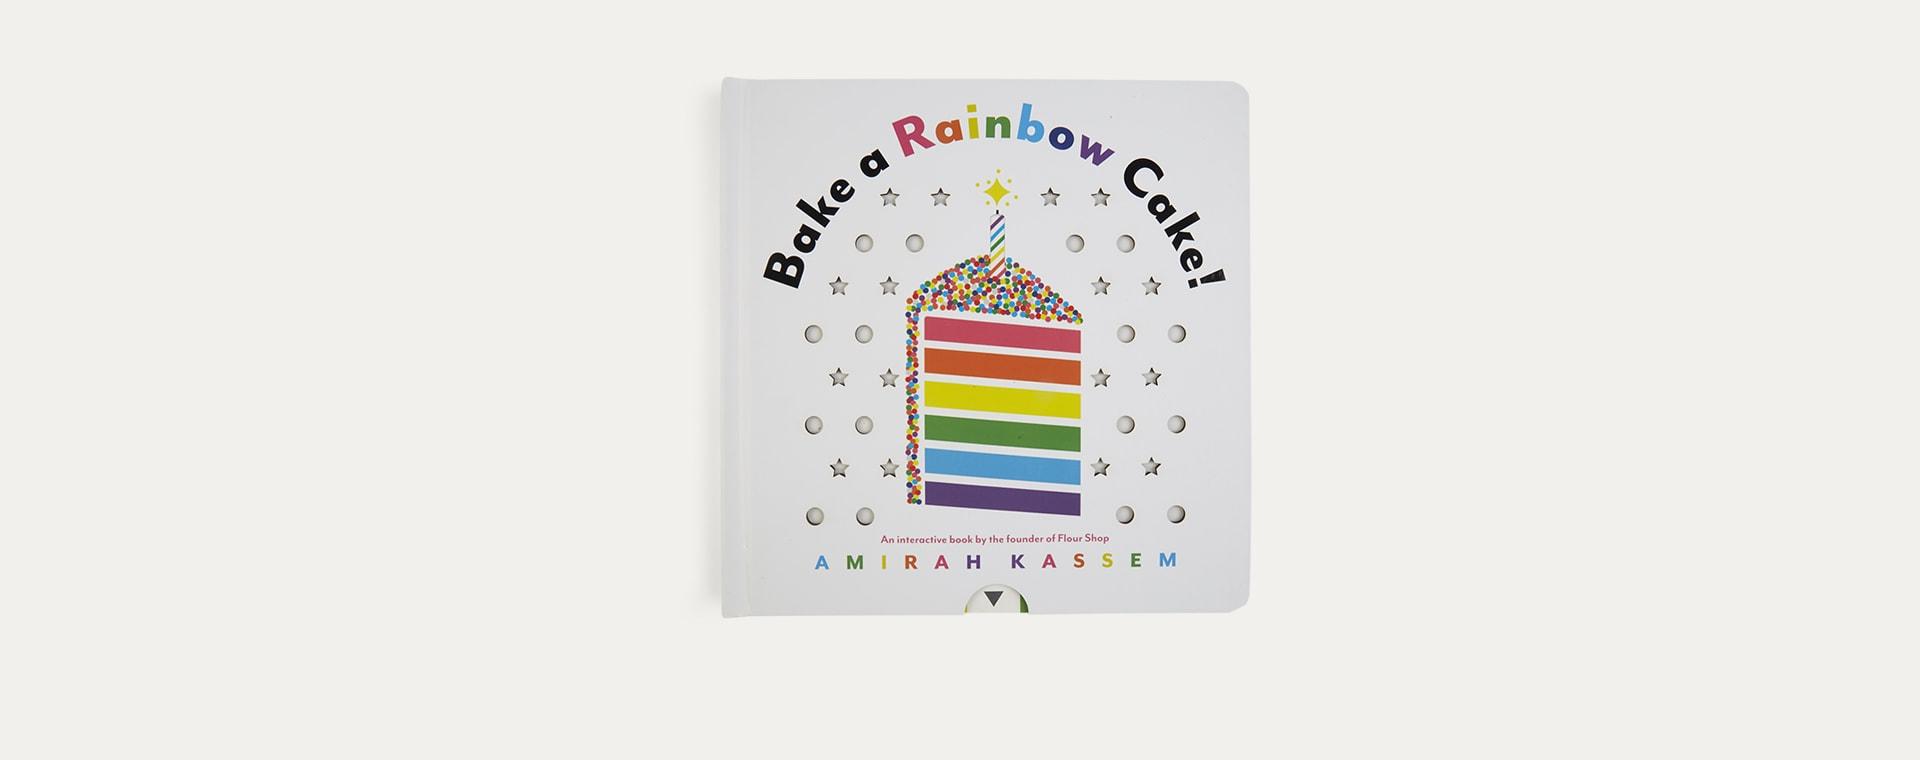 Multi Abrams & Chronicle Books Bake A Rainbow Cake